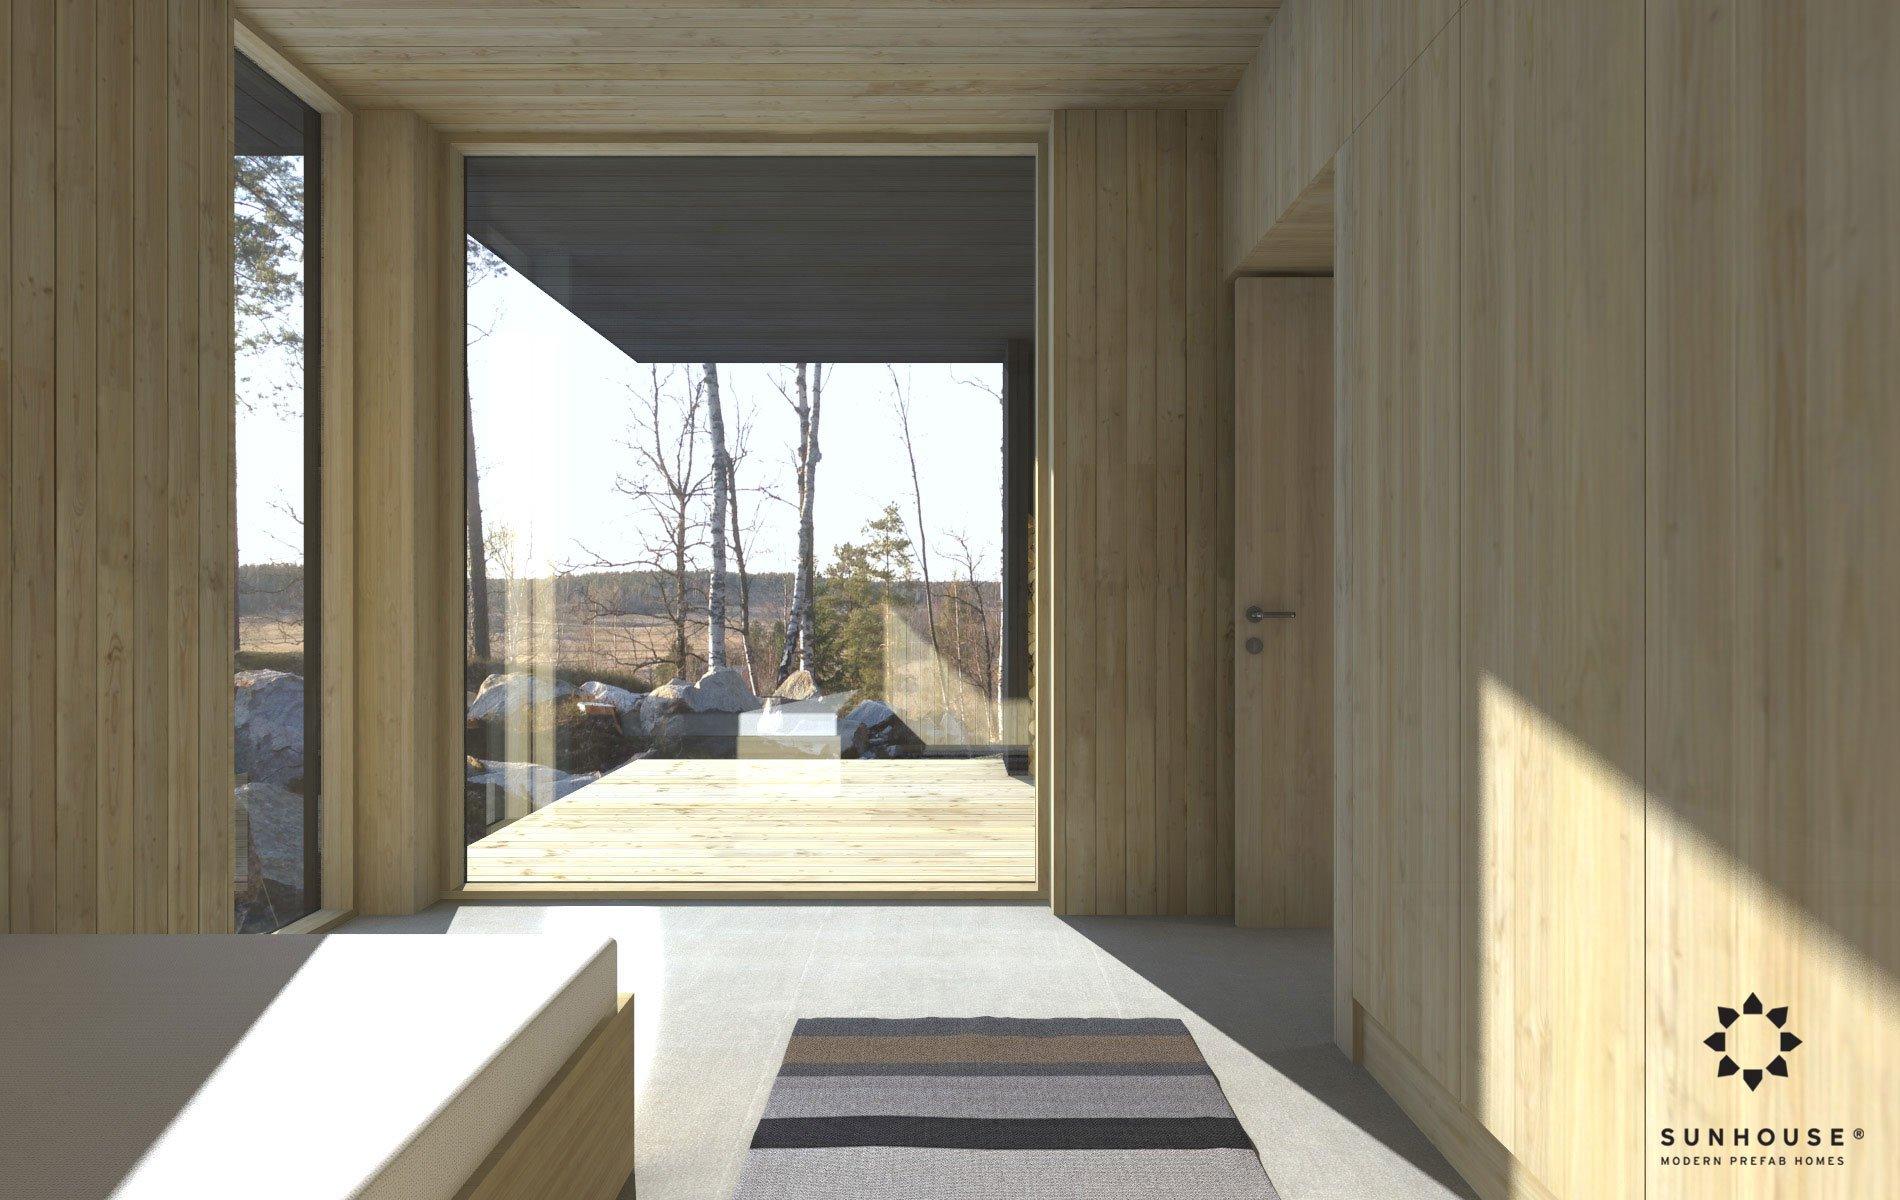 Sunhouse S190100 - Moderni omakotitalo